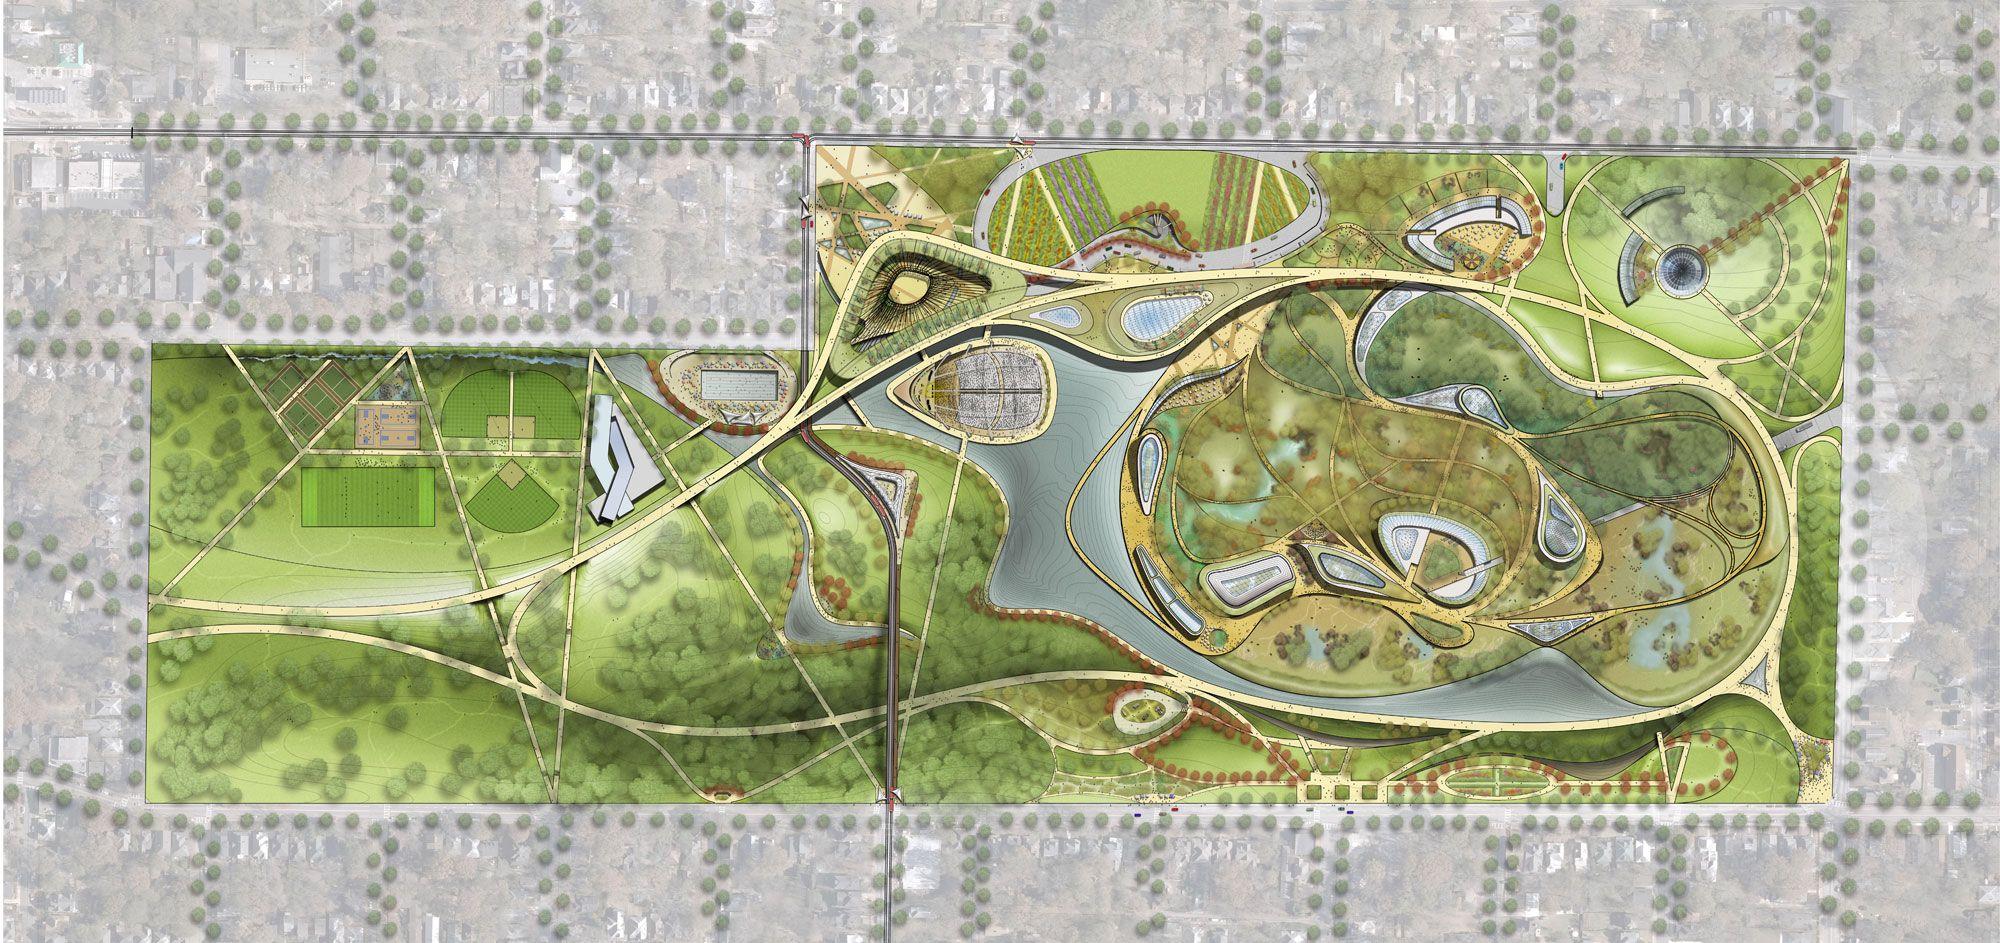 Grant park and zoo atlanta masterplan landscape plans for Park landscape design